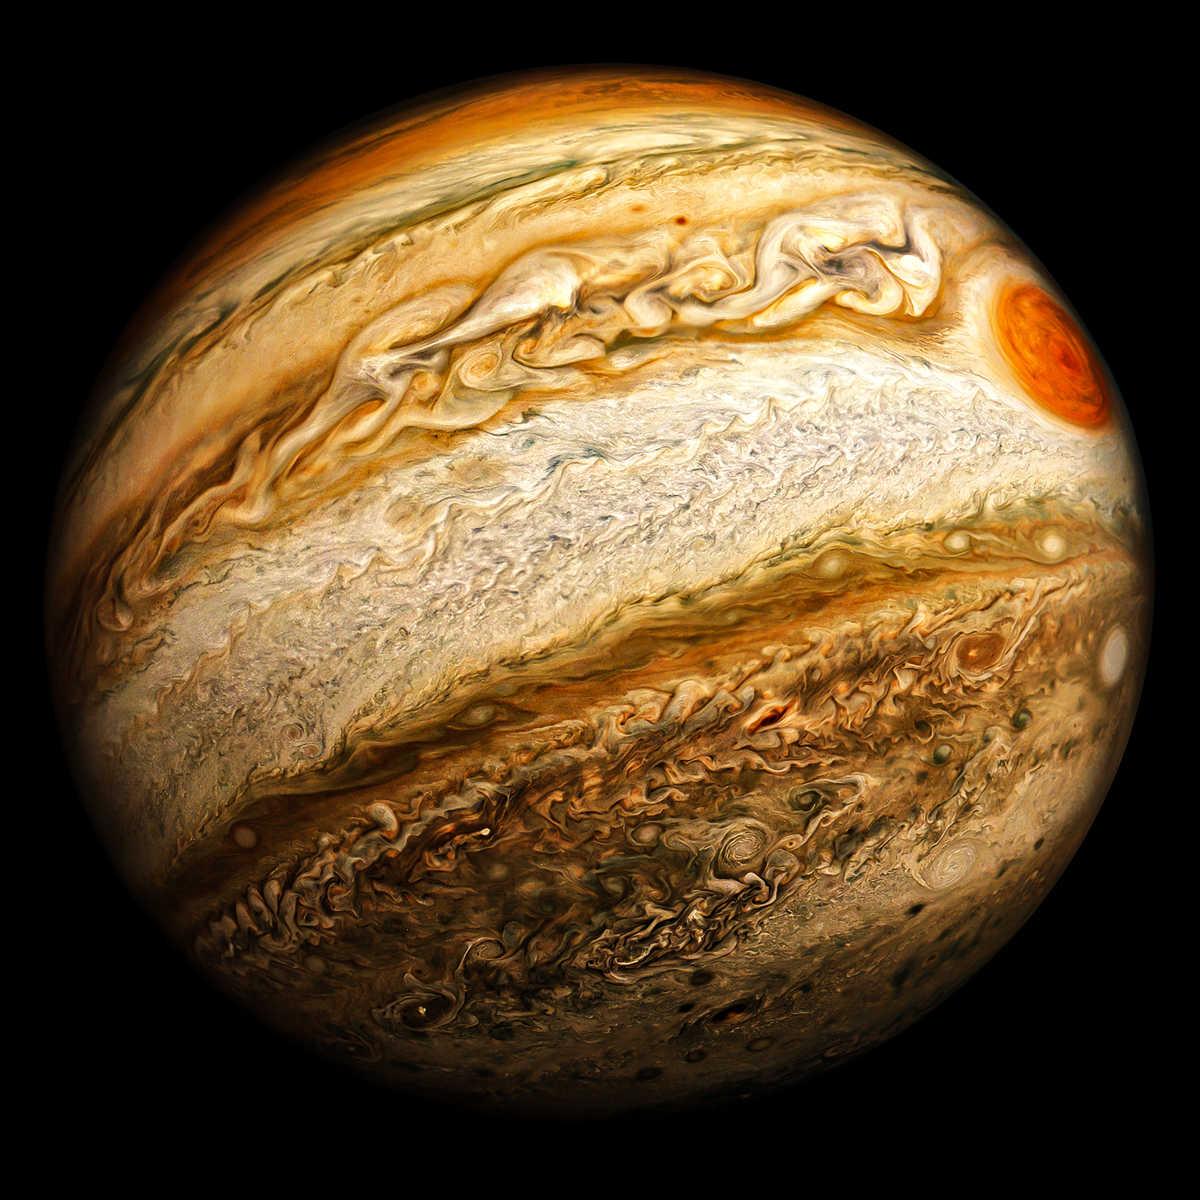 Close up of Jupiter showing an orange spot